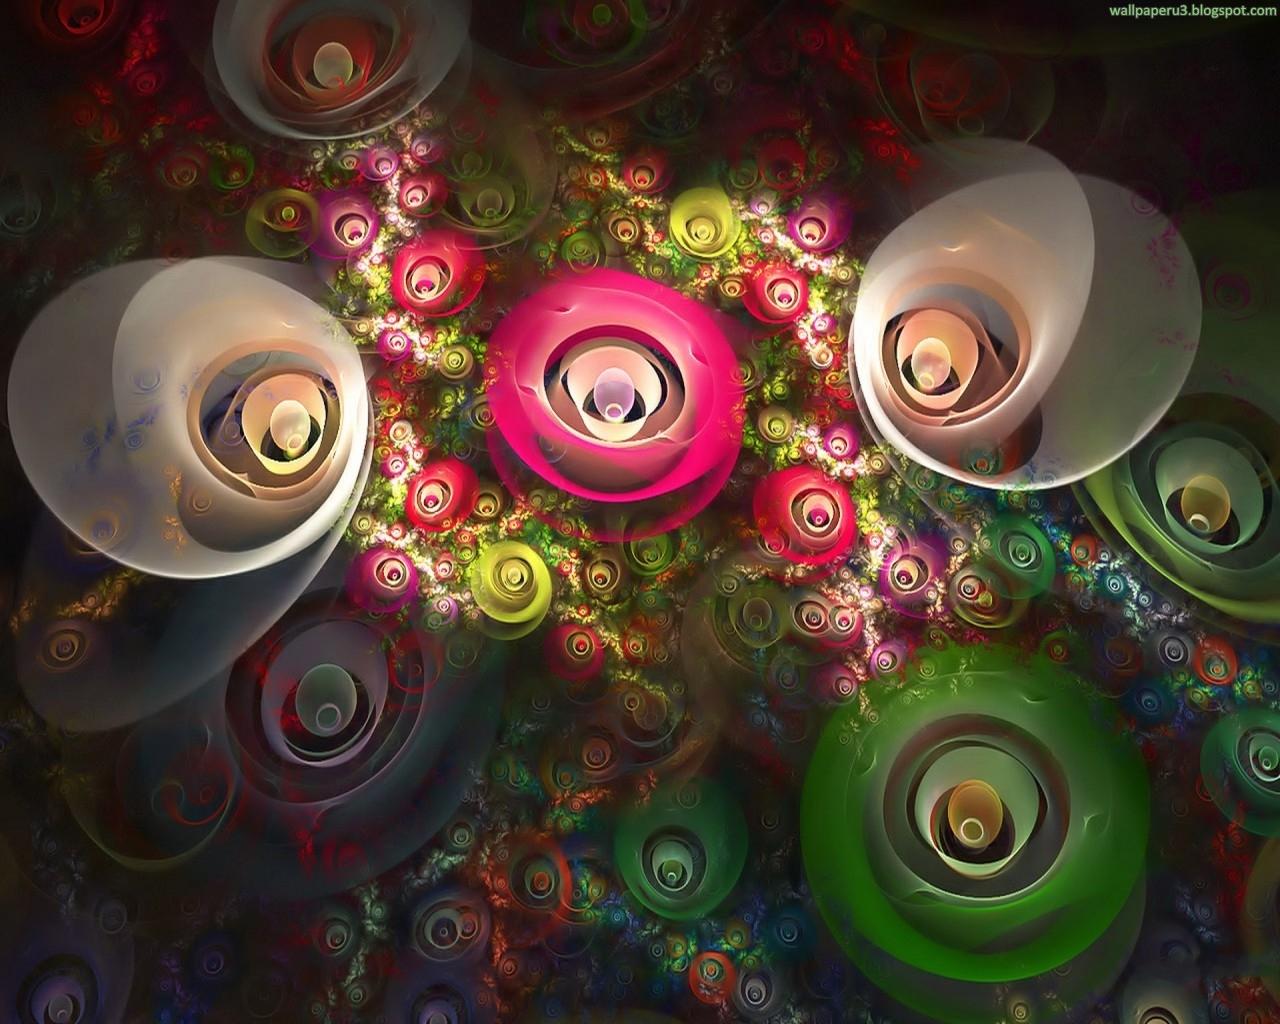 3d flowers wallpapers - Flower wallpaper 3d pic ...